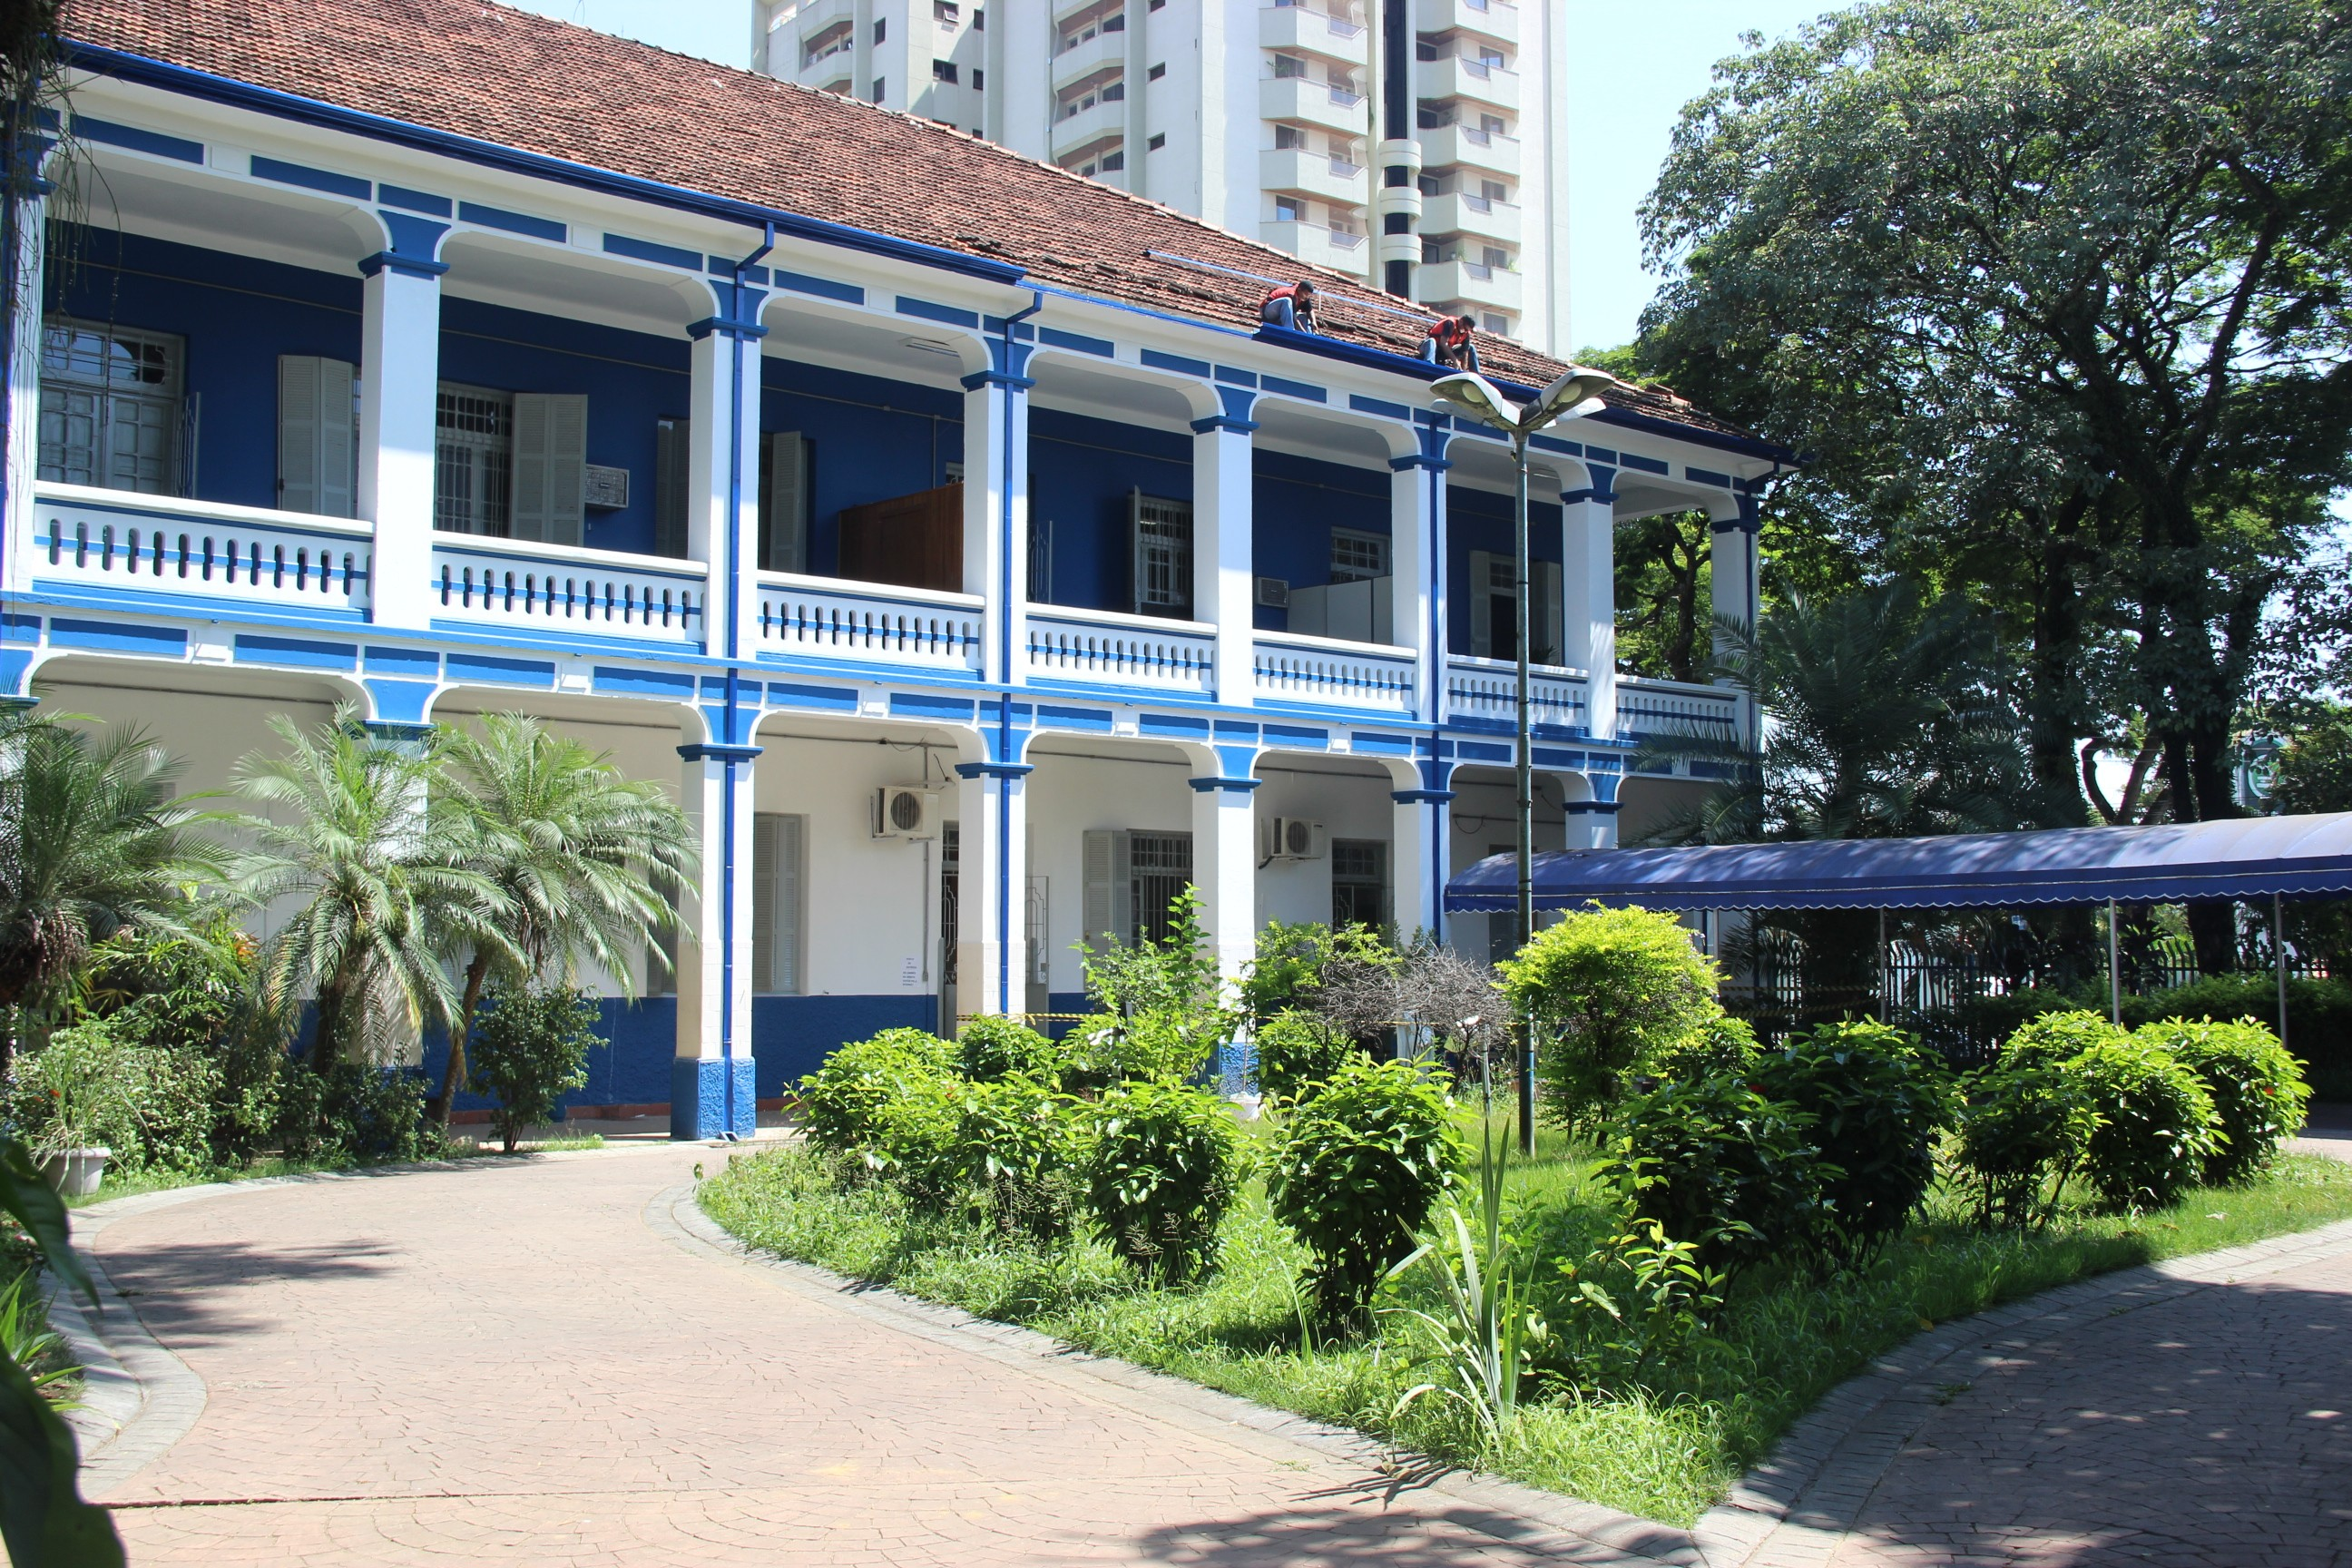 Prefeitura de Taubaté alerta comerciantes para golpe de falso fiscal